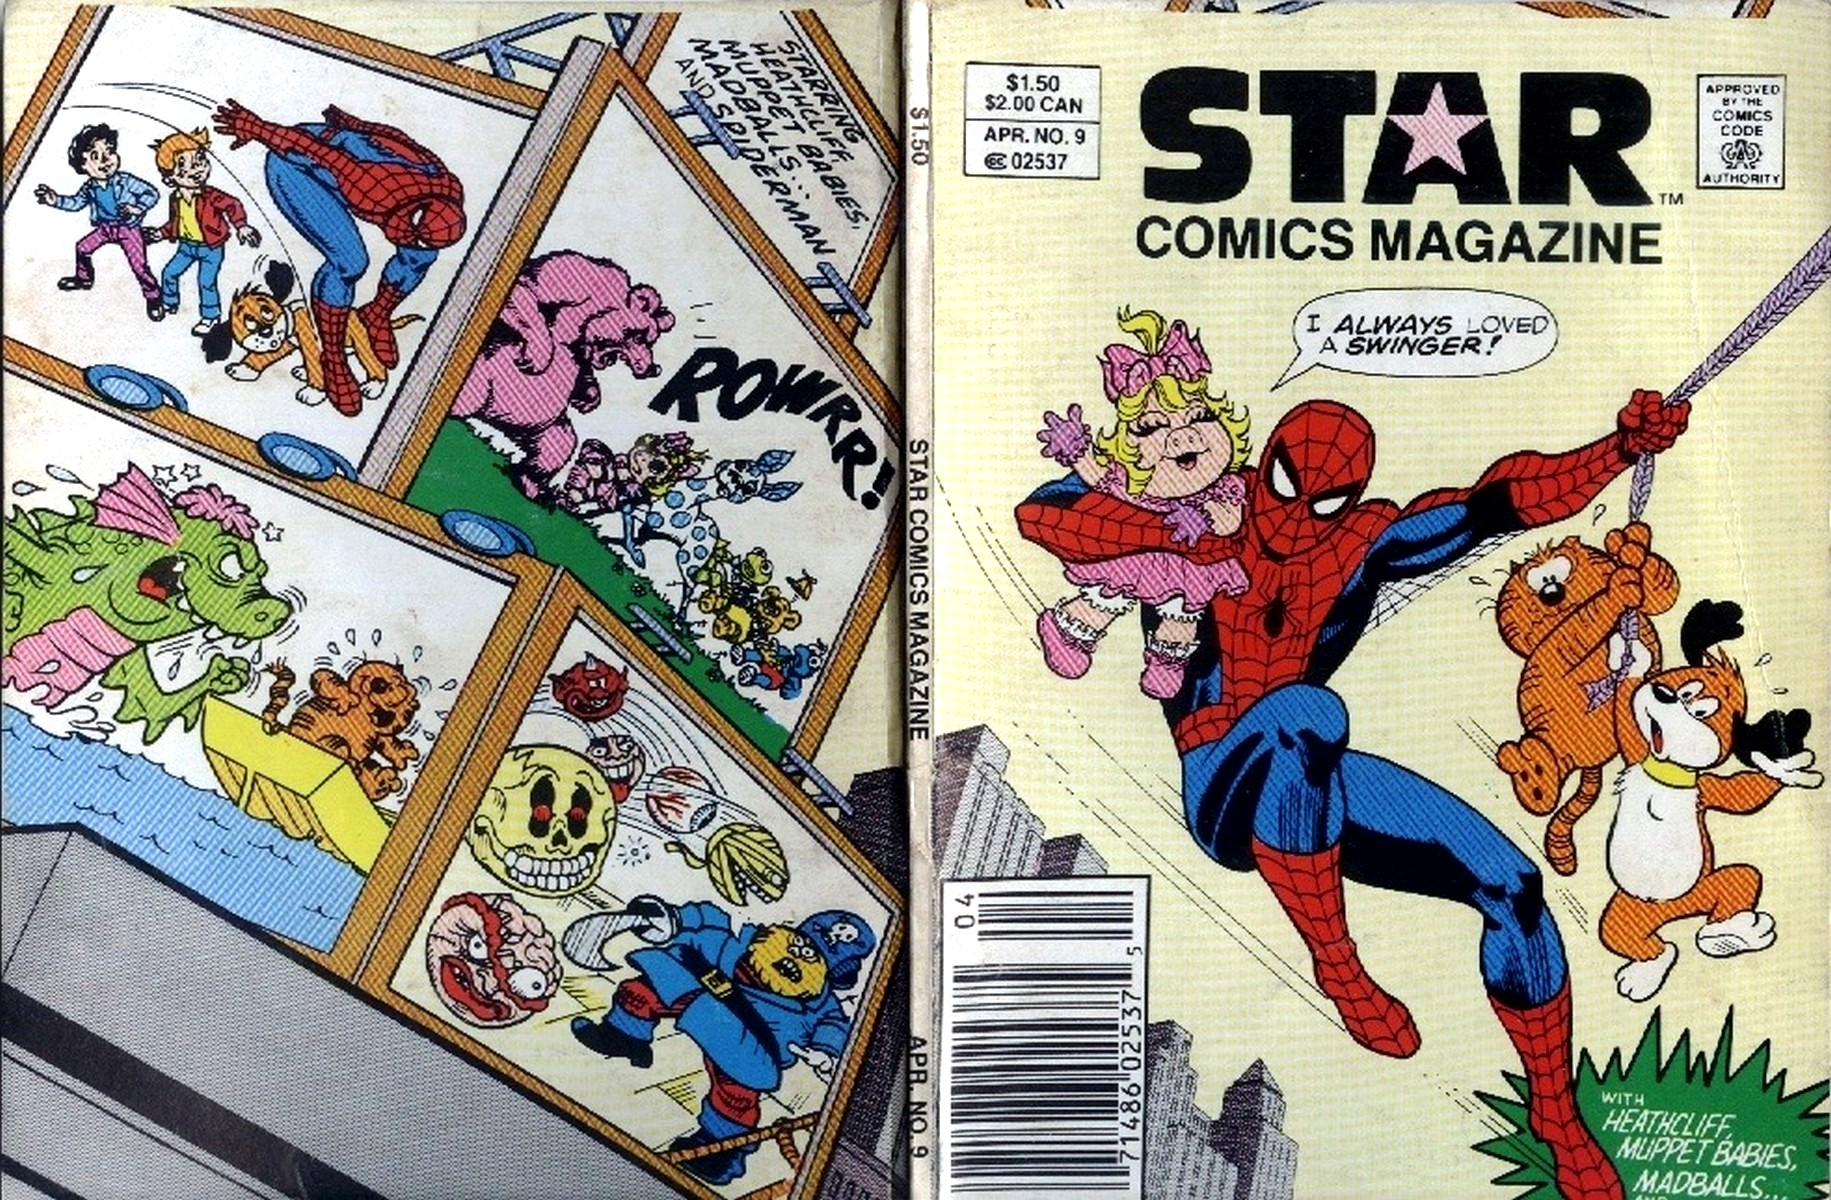 Star Comics Magazine Vol 1 9